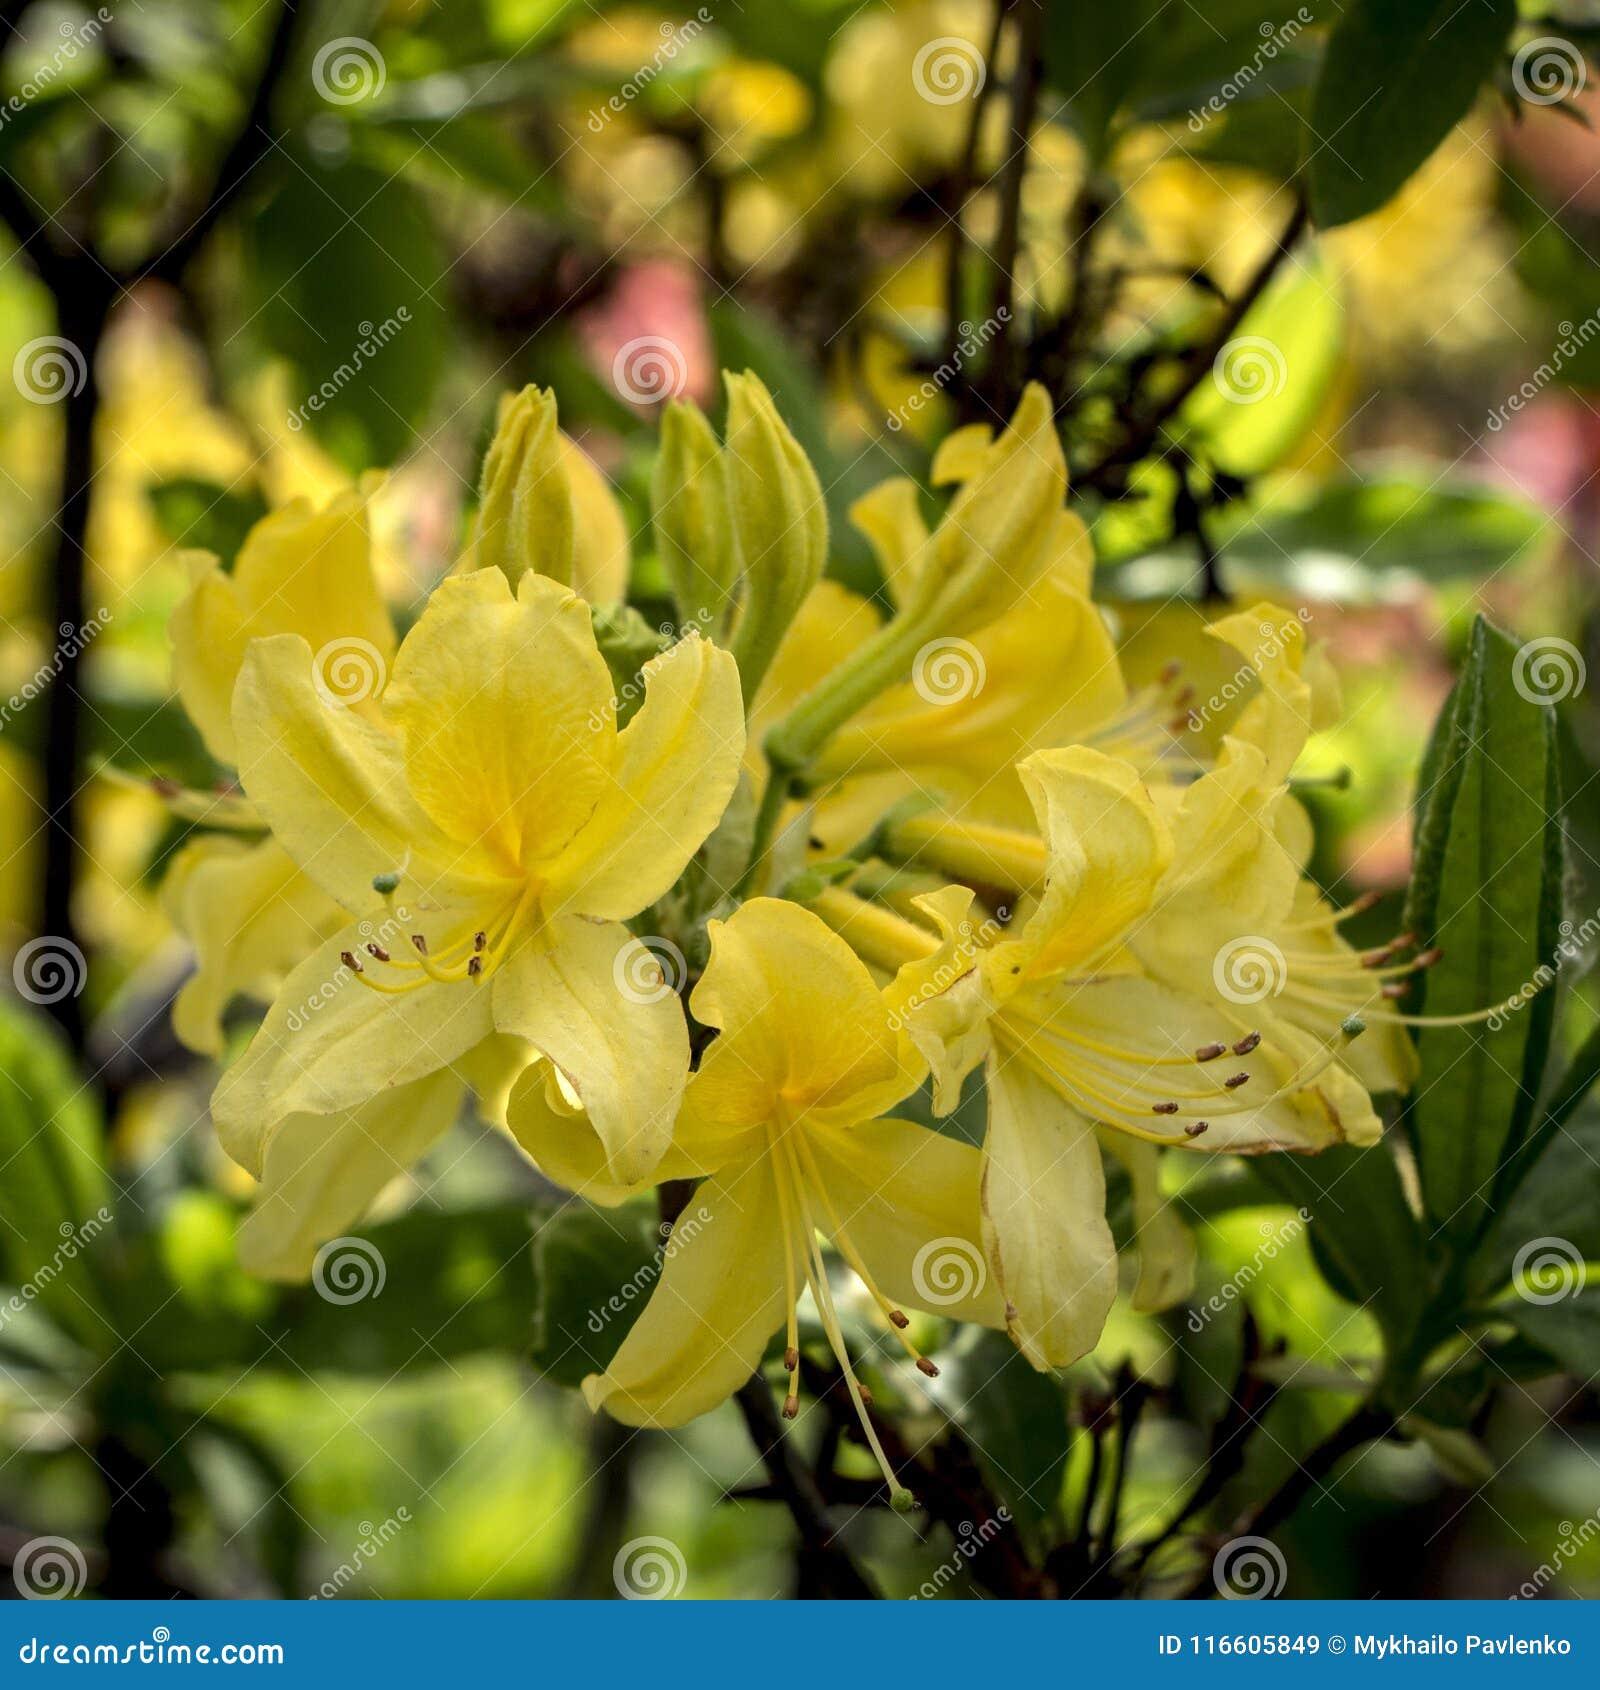 Rhododendron azalea bush with yellow flowers in garden on green download rhododendron azalea bush with yellow flowers in garden on green bokeh backgraund stock image mightylinksfo